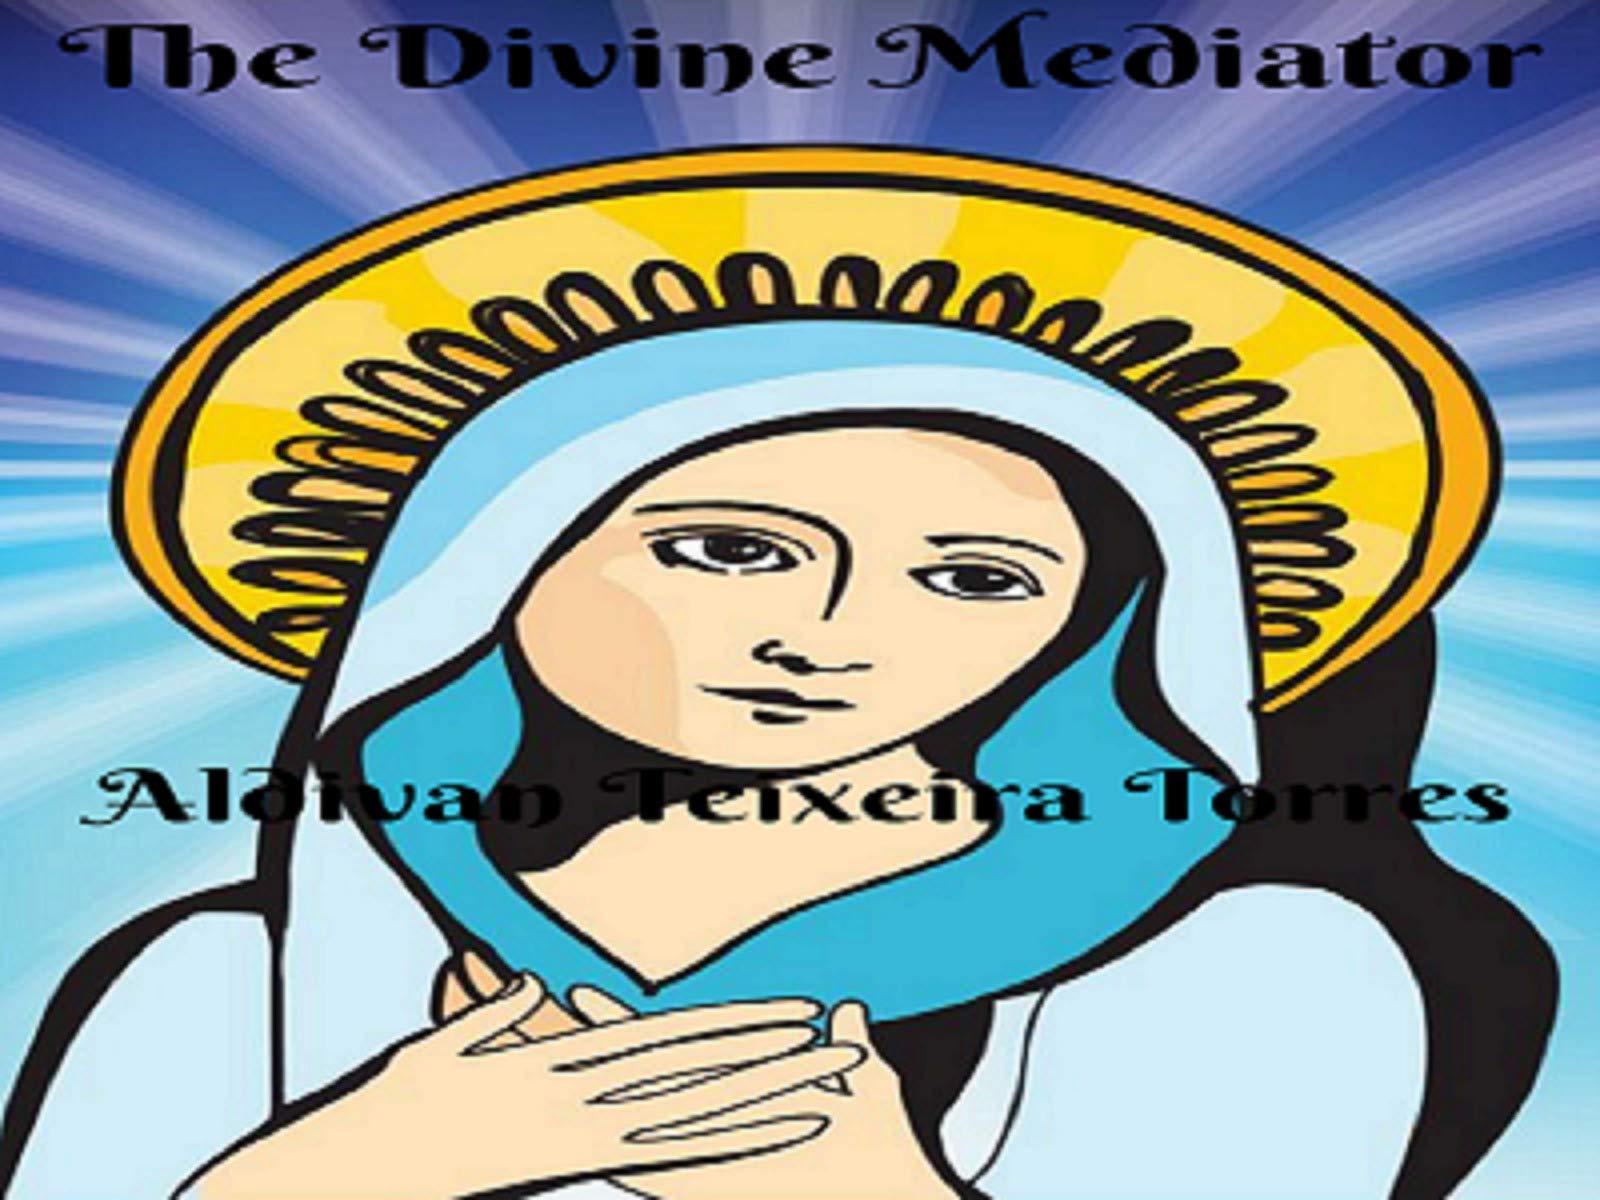 The Divine Mediator - Season 1